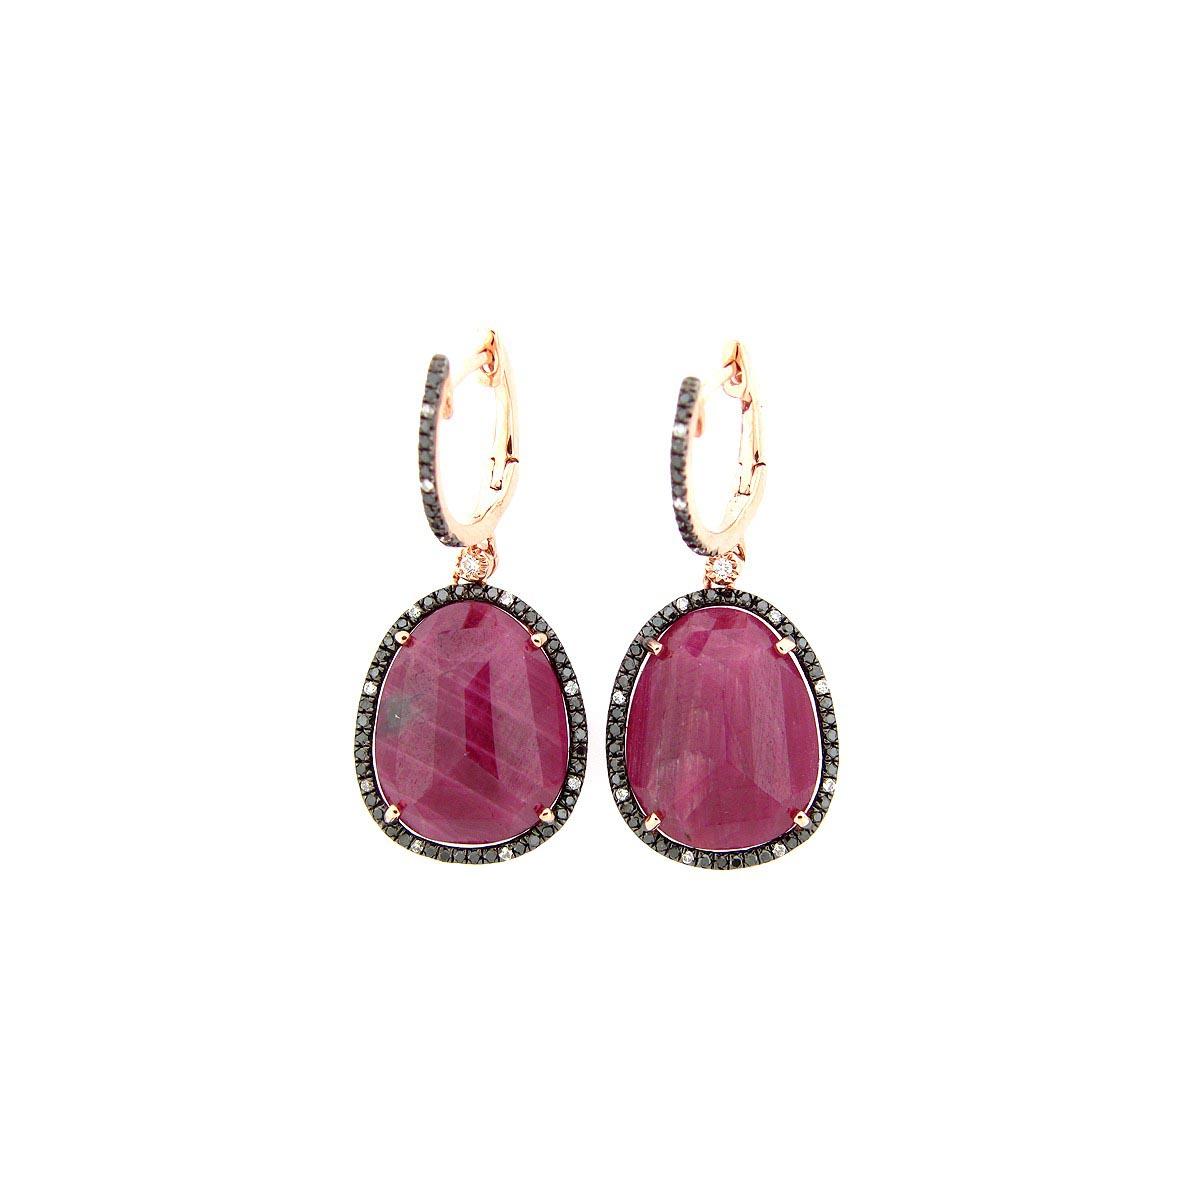 Rose Cut Ruby, Black & White Diamond Earring